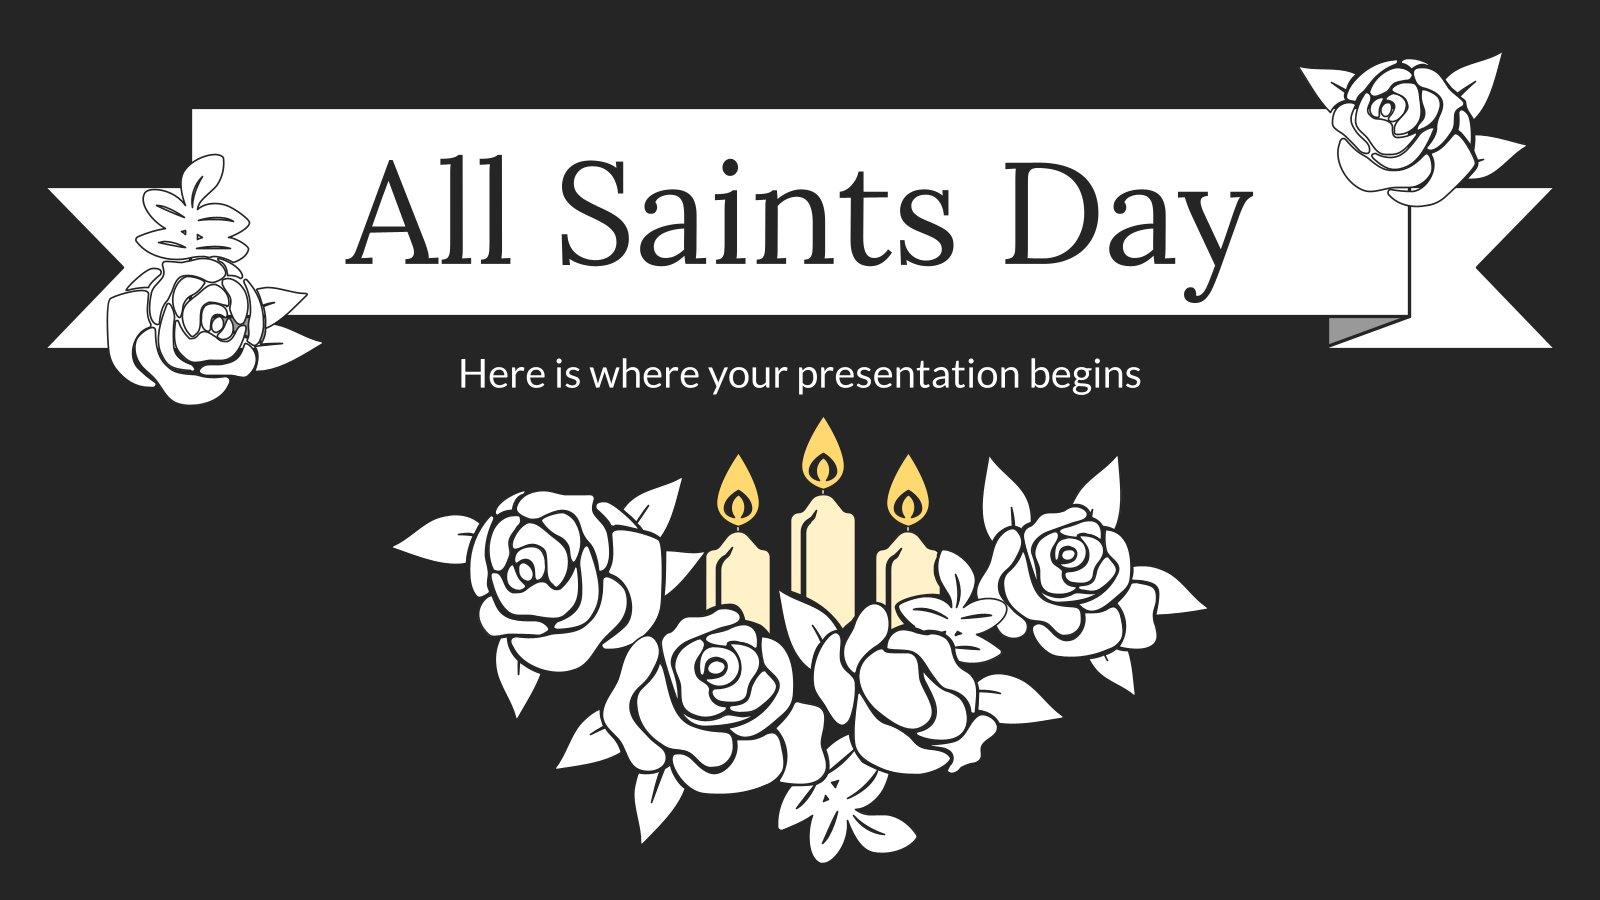 All Saints Day presentation template